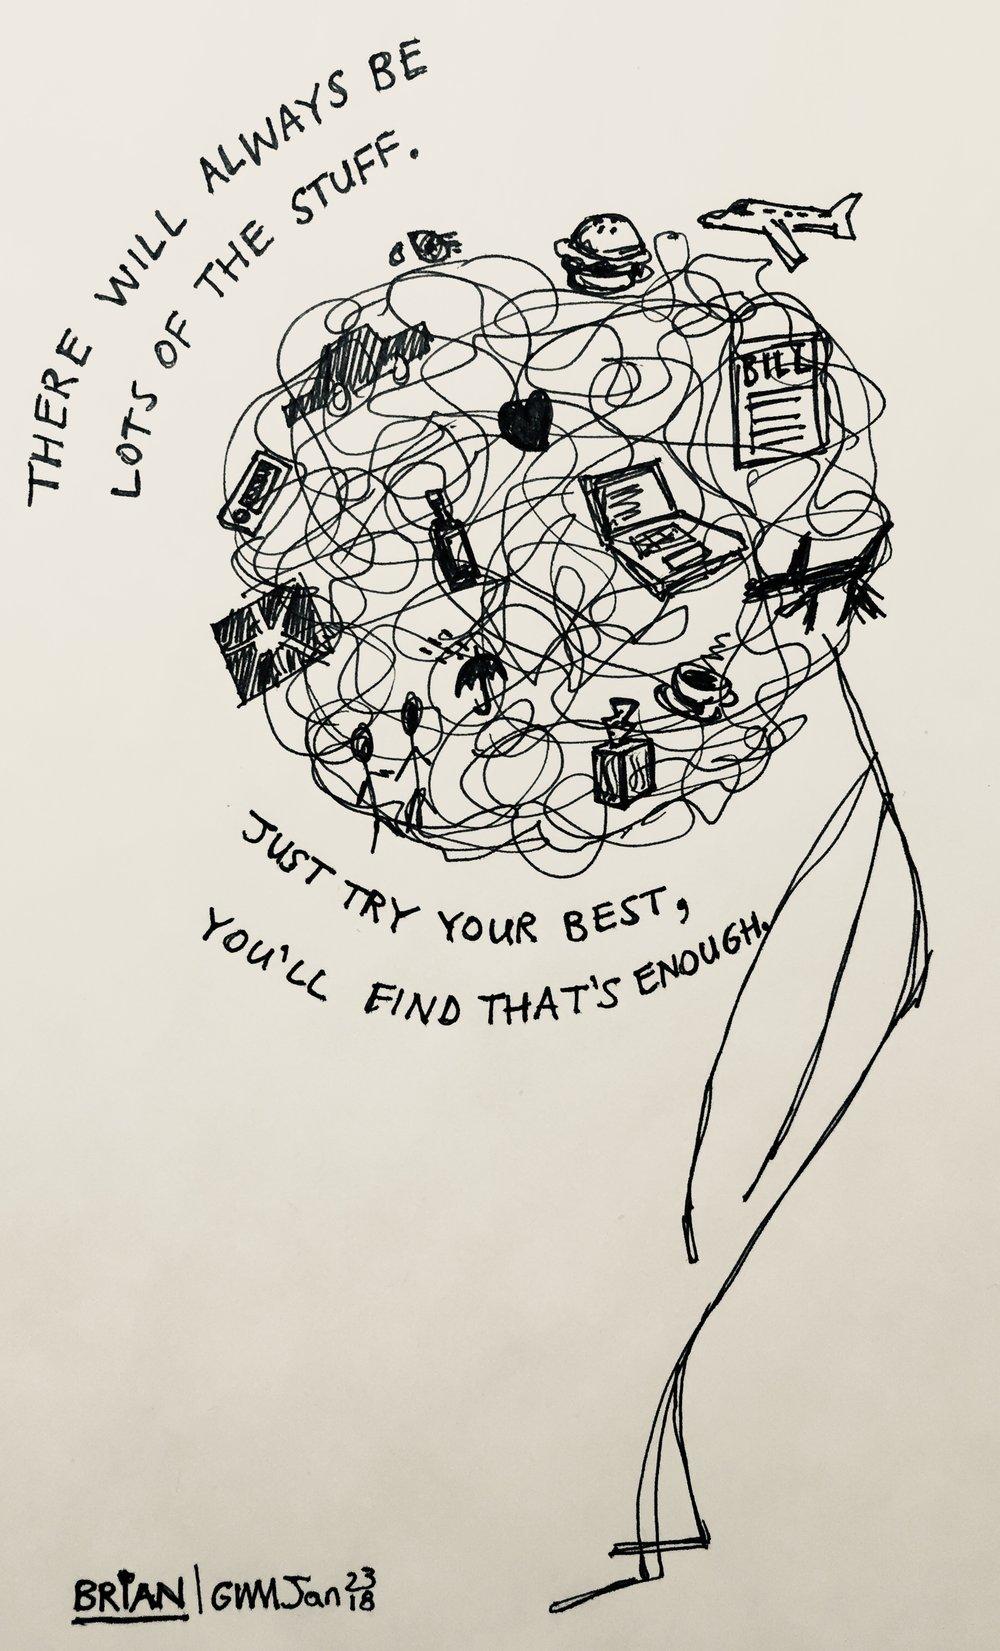 BRIAN - Try Your Best - Jan 26 2018.jpg